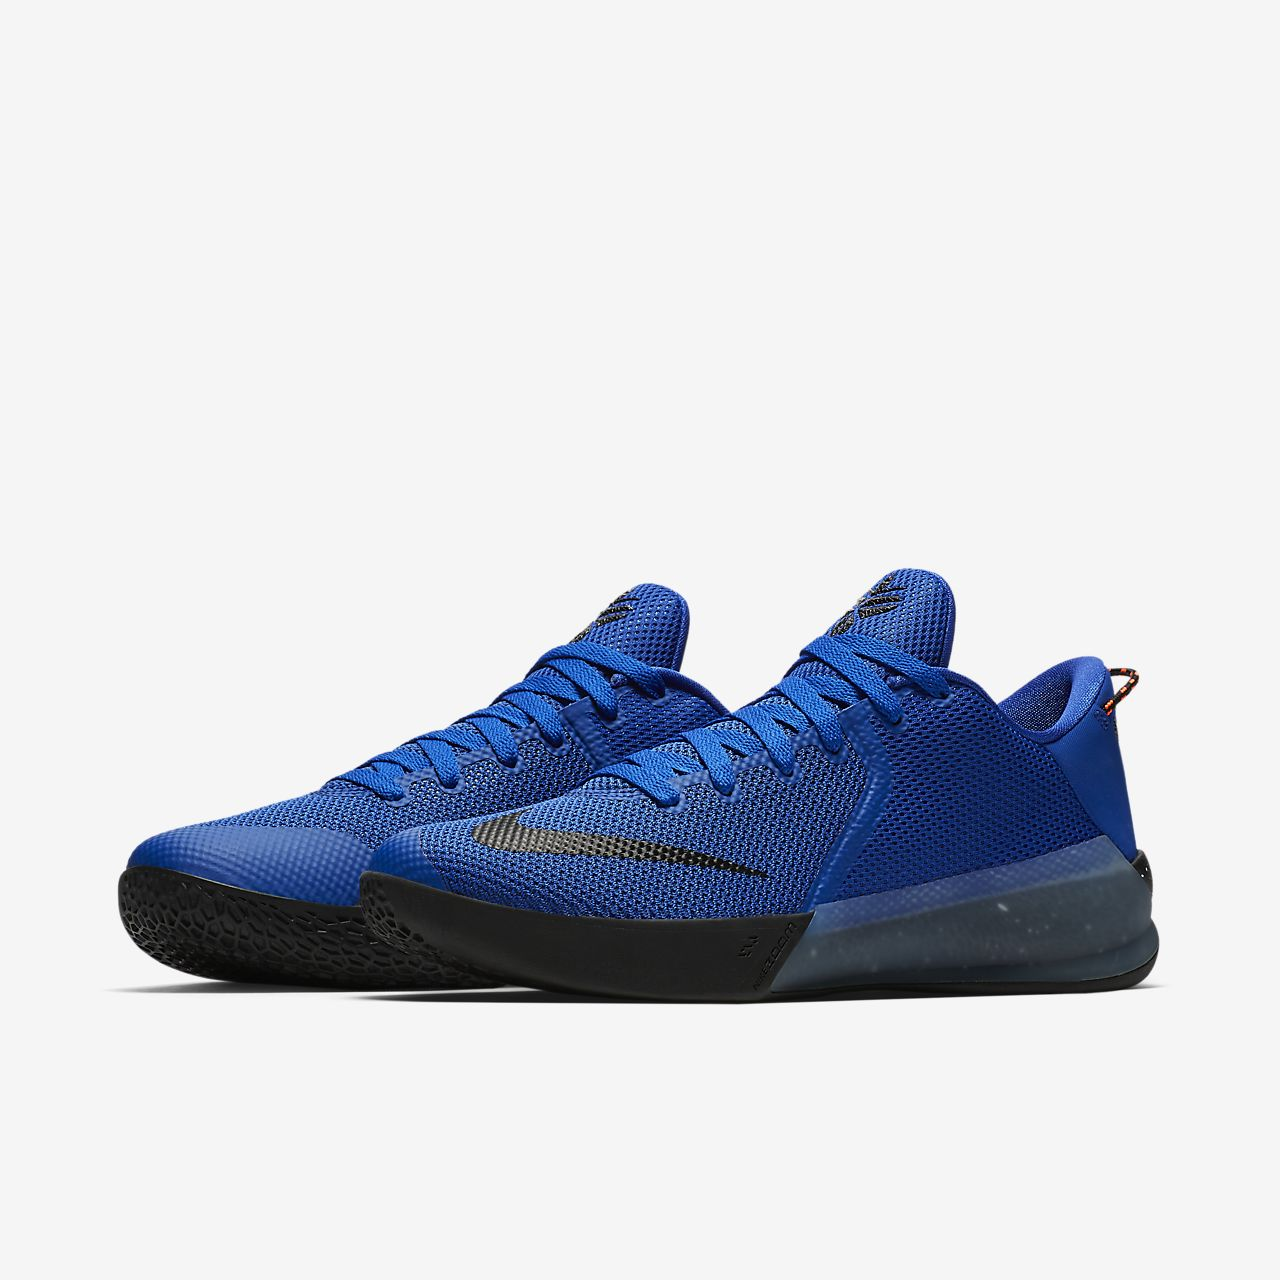 728d7c146ba รองเท้าบาสเก็ตบอลผู้ชาย Nike Zoom Kobe Venomenon 6. Nike.com TH